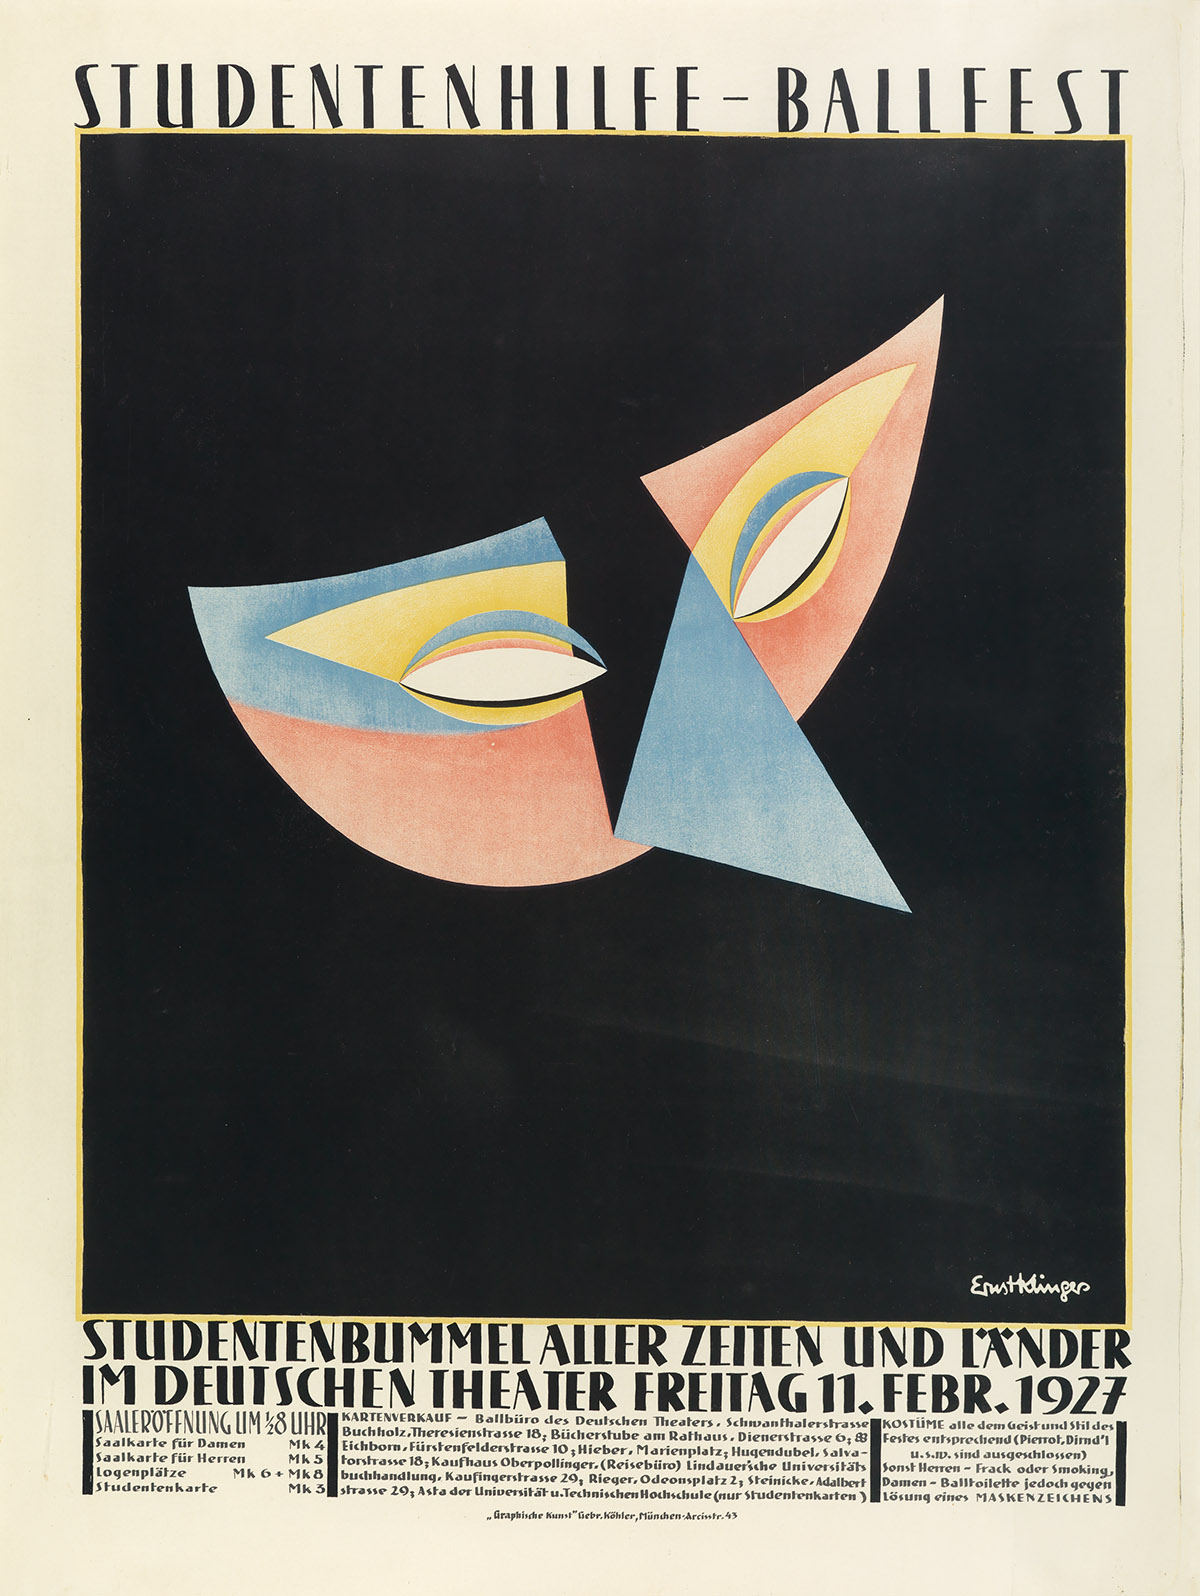 ERNST-KLINGER-(1900-1962)-STUDENTENHILFE---BALLFEST-1927-49x